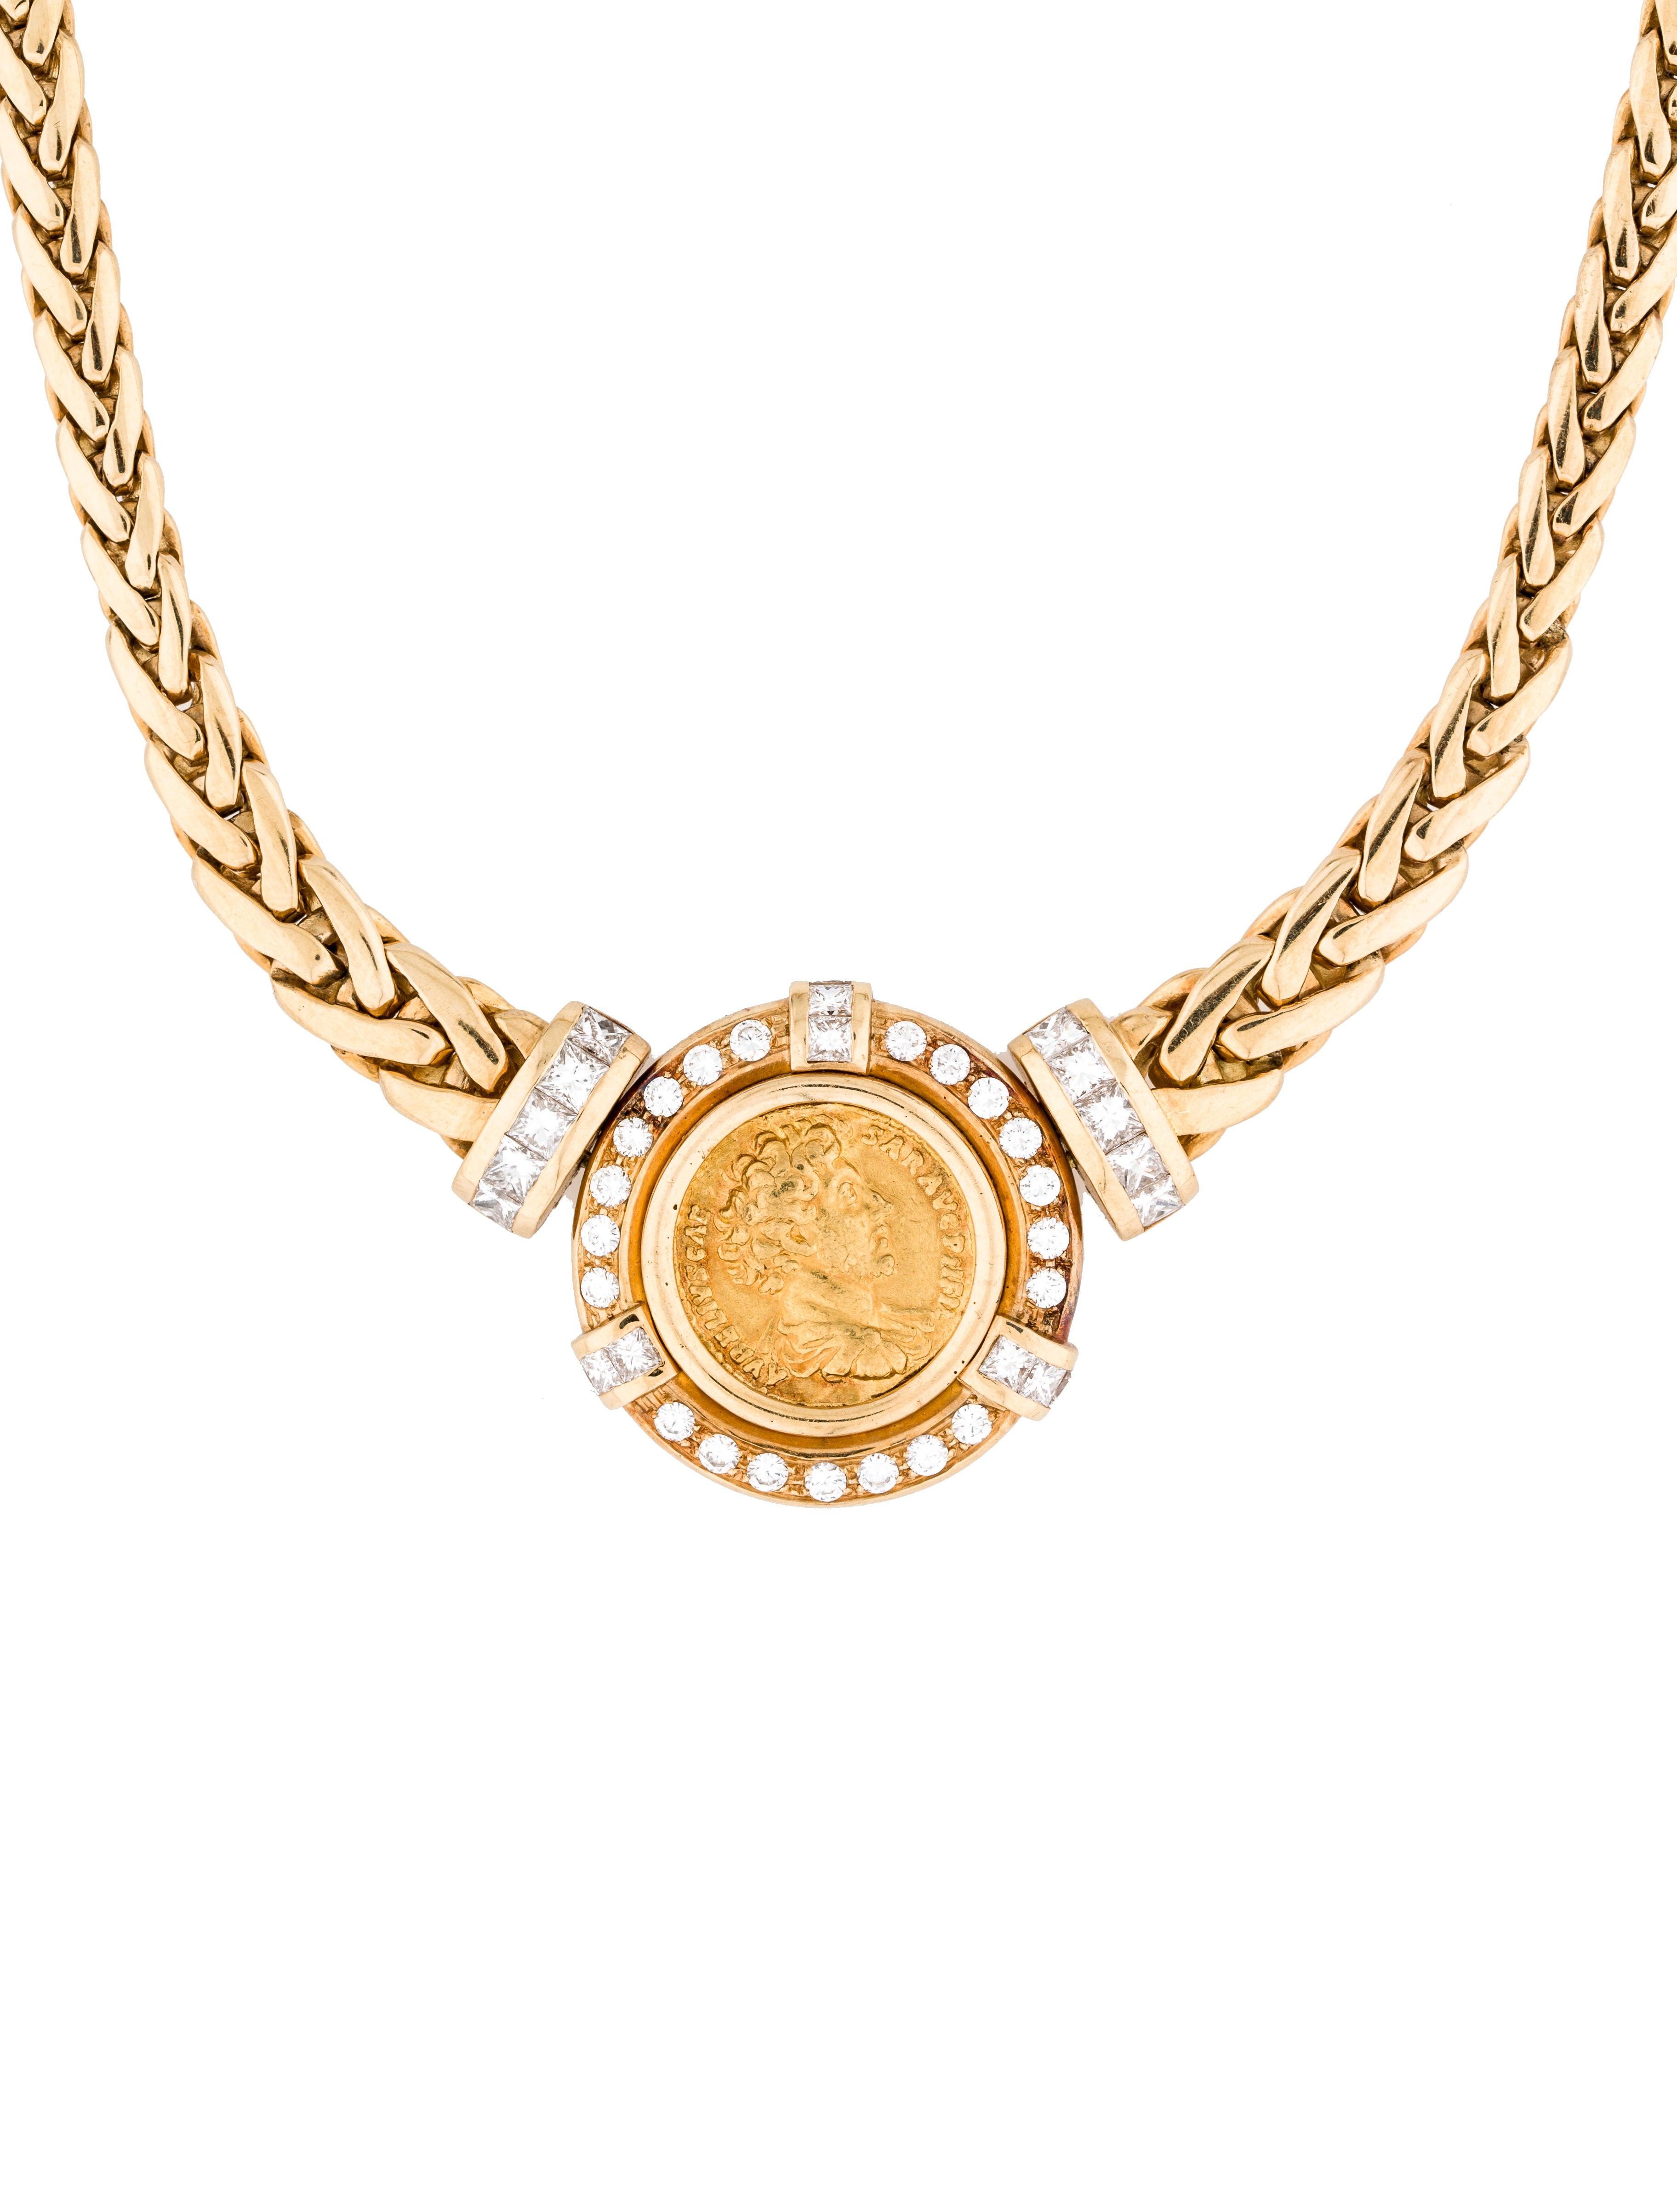 18k coin necklace necklaces neckl23944 the